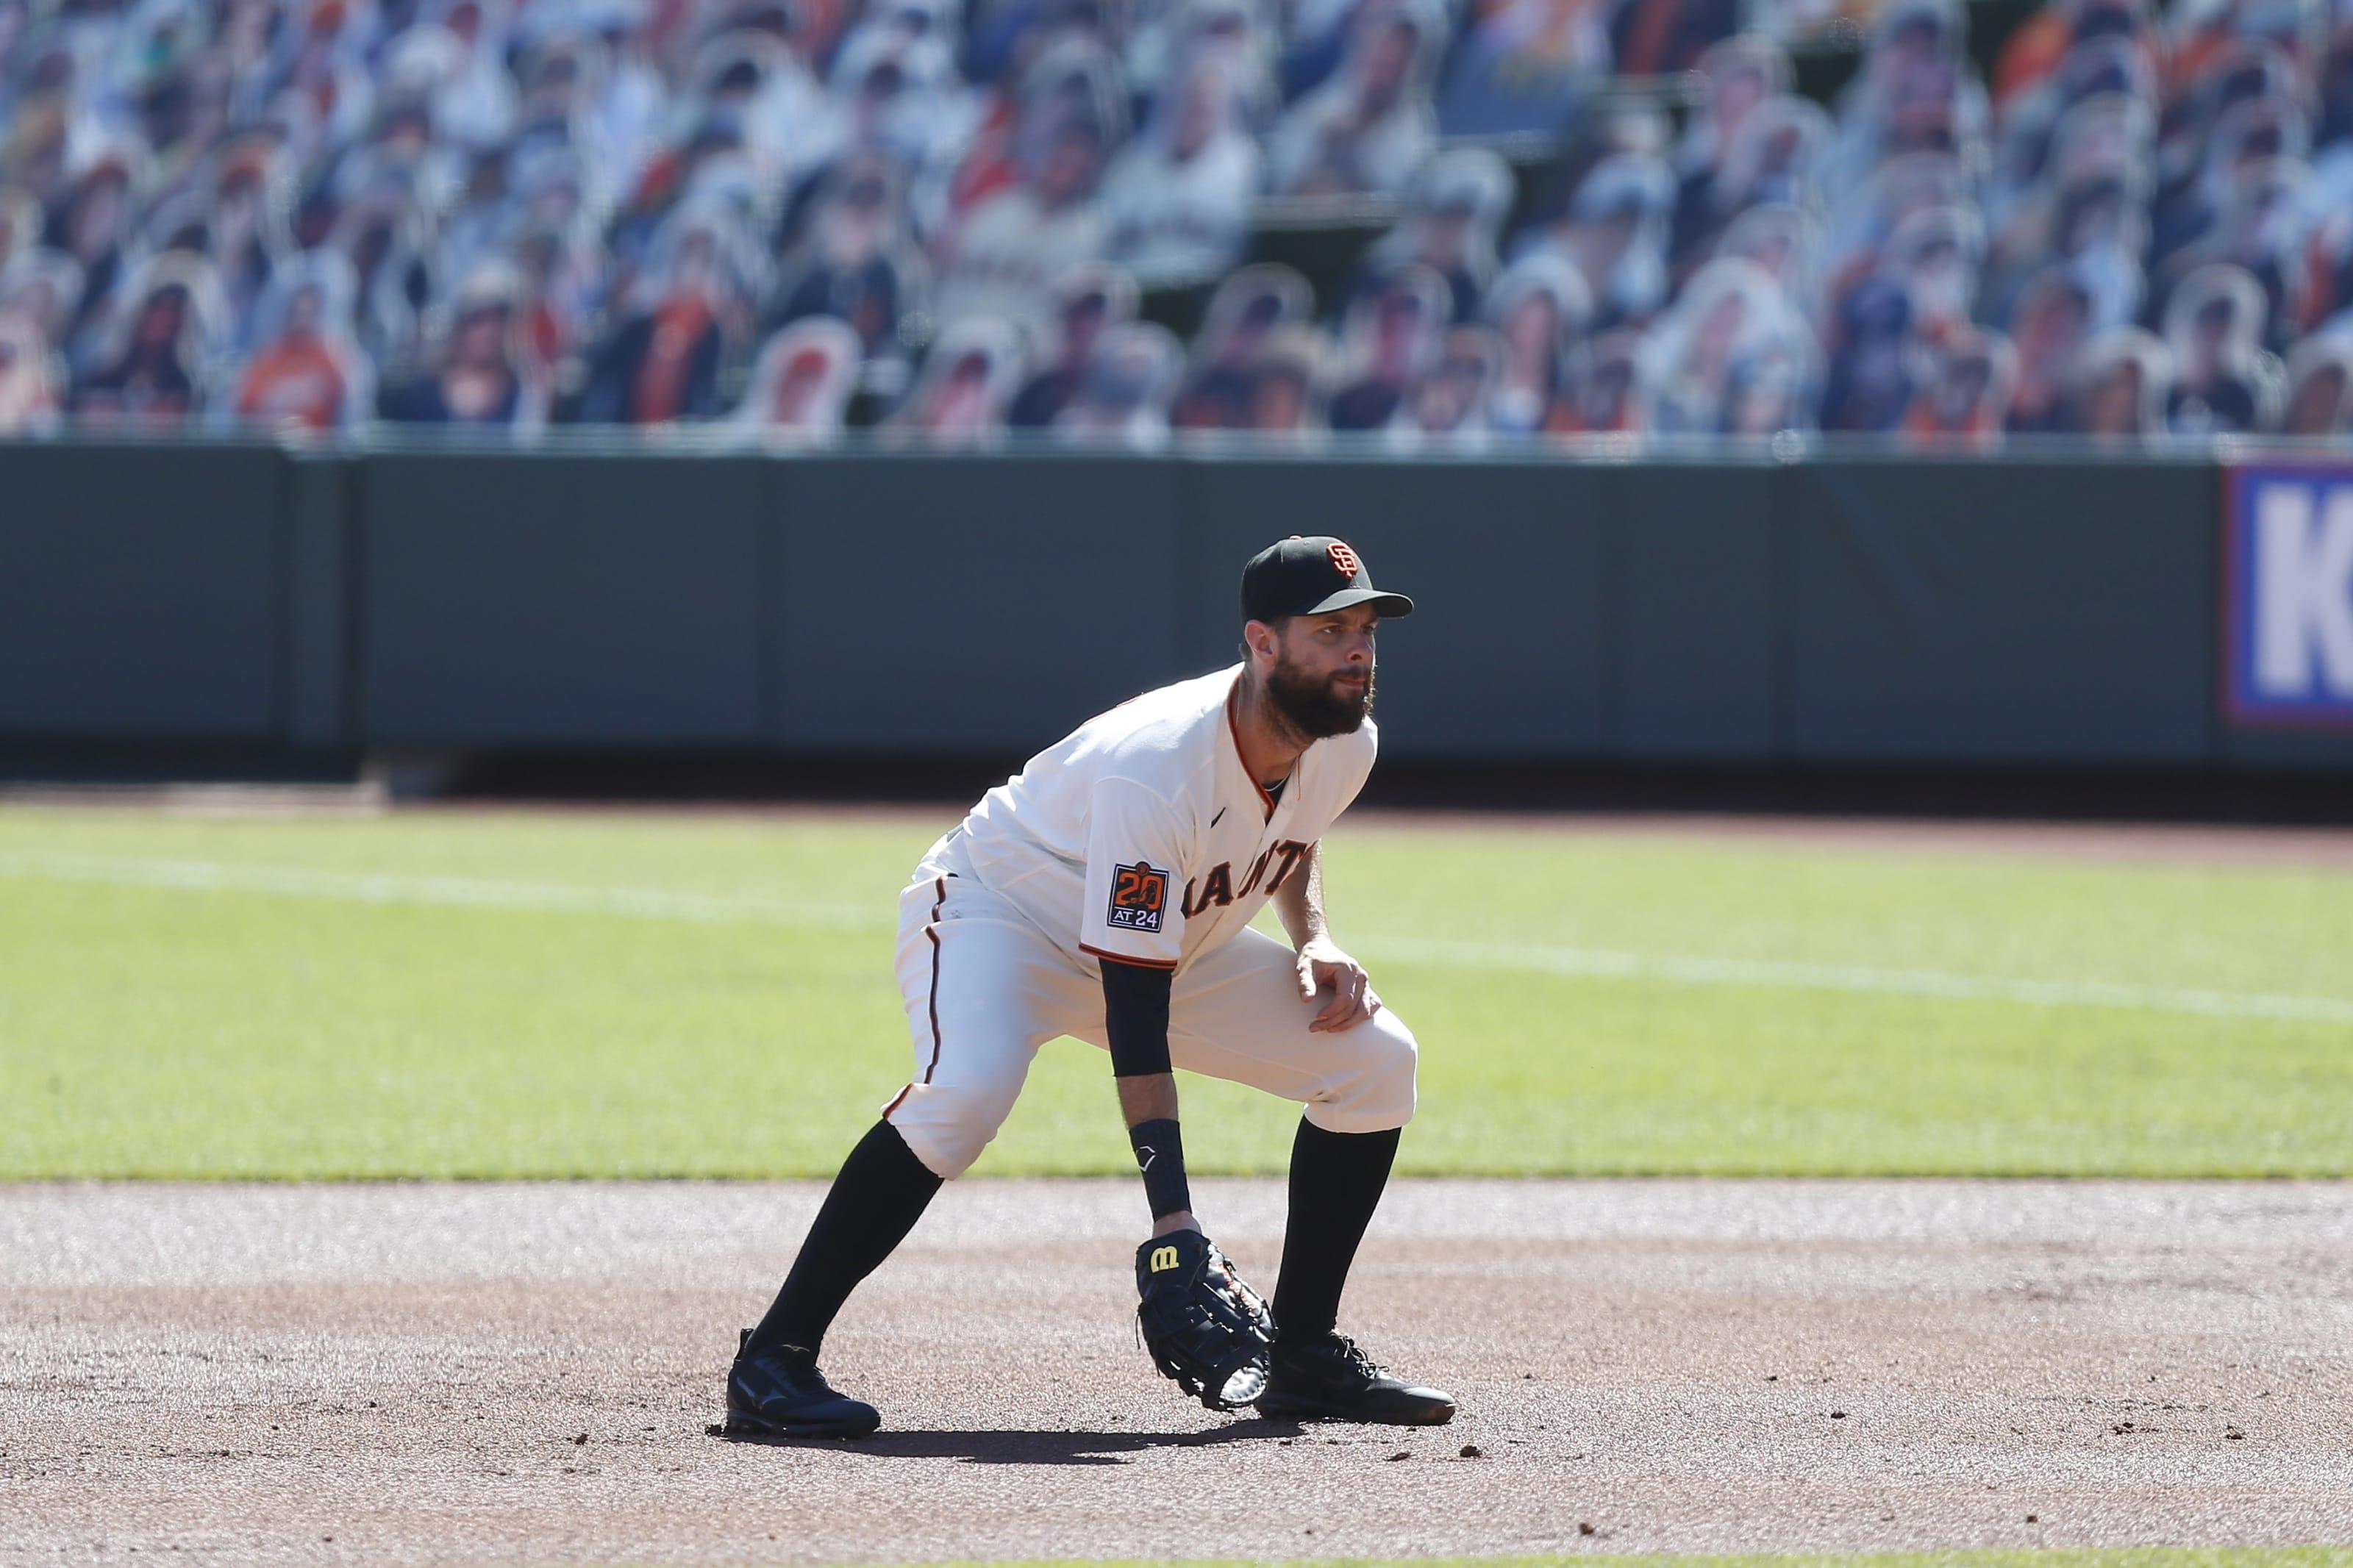 SF Giants: Health Update on First Baseman Brandon Belt